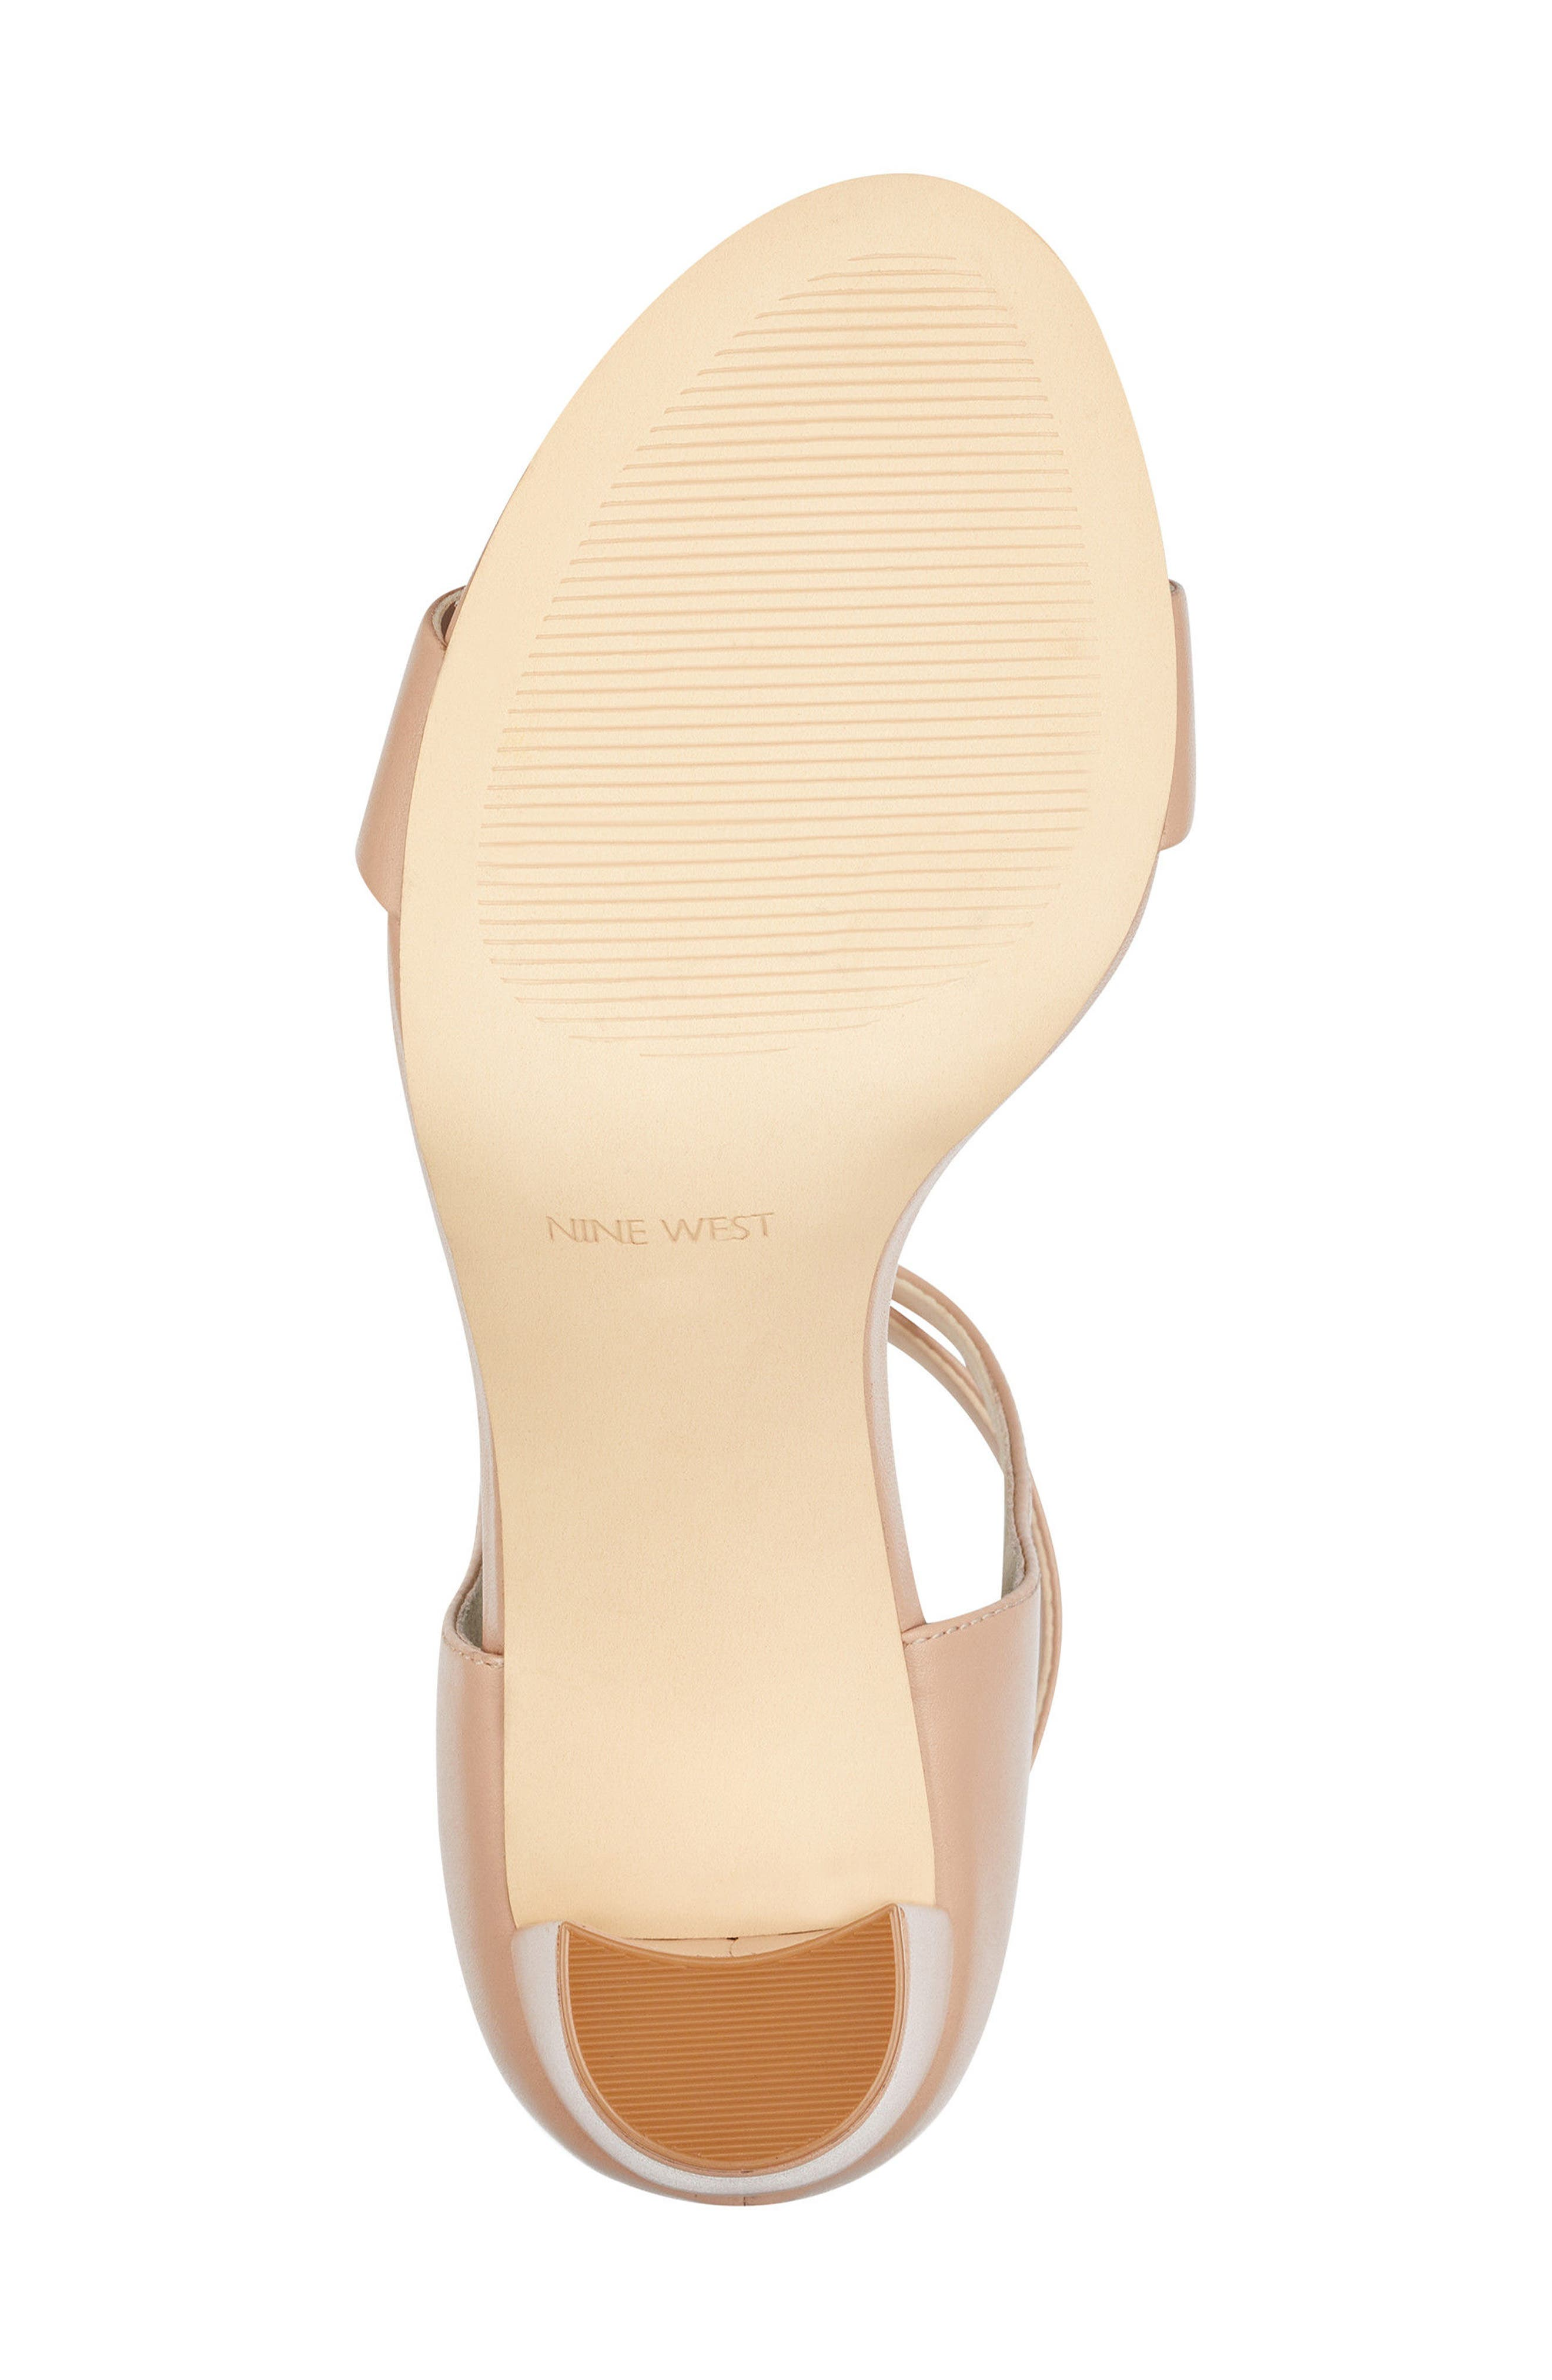 Nunzaya Ankle Strap Sandal,                             Alternate thumbnail 6, color,                             270